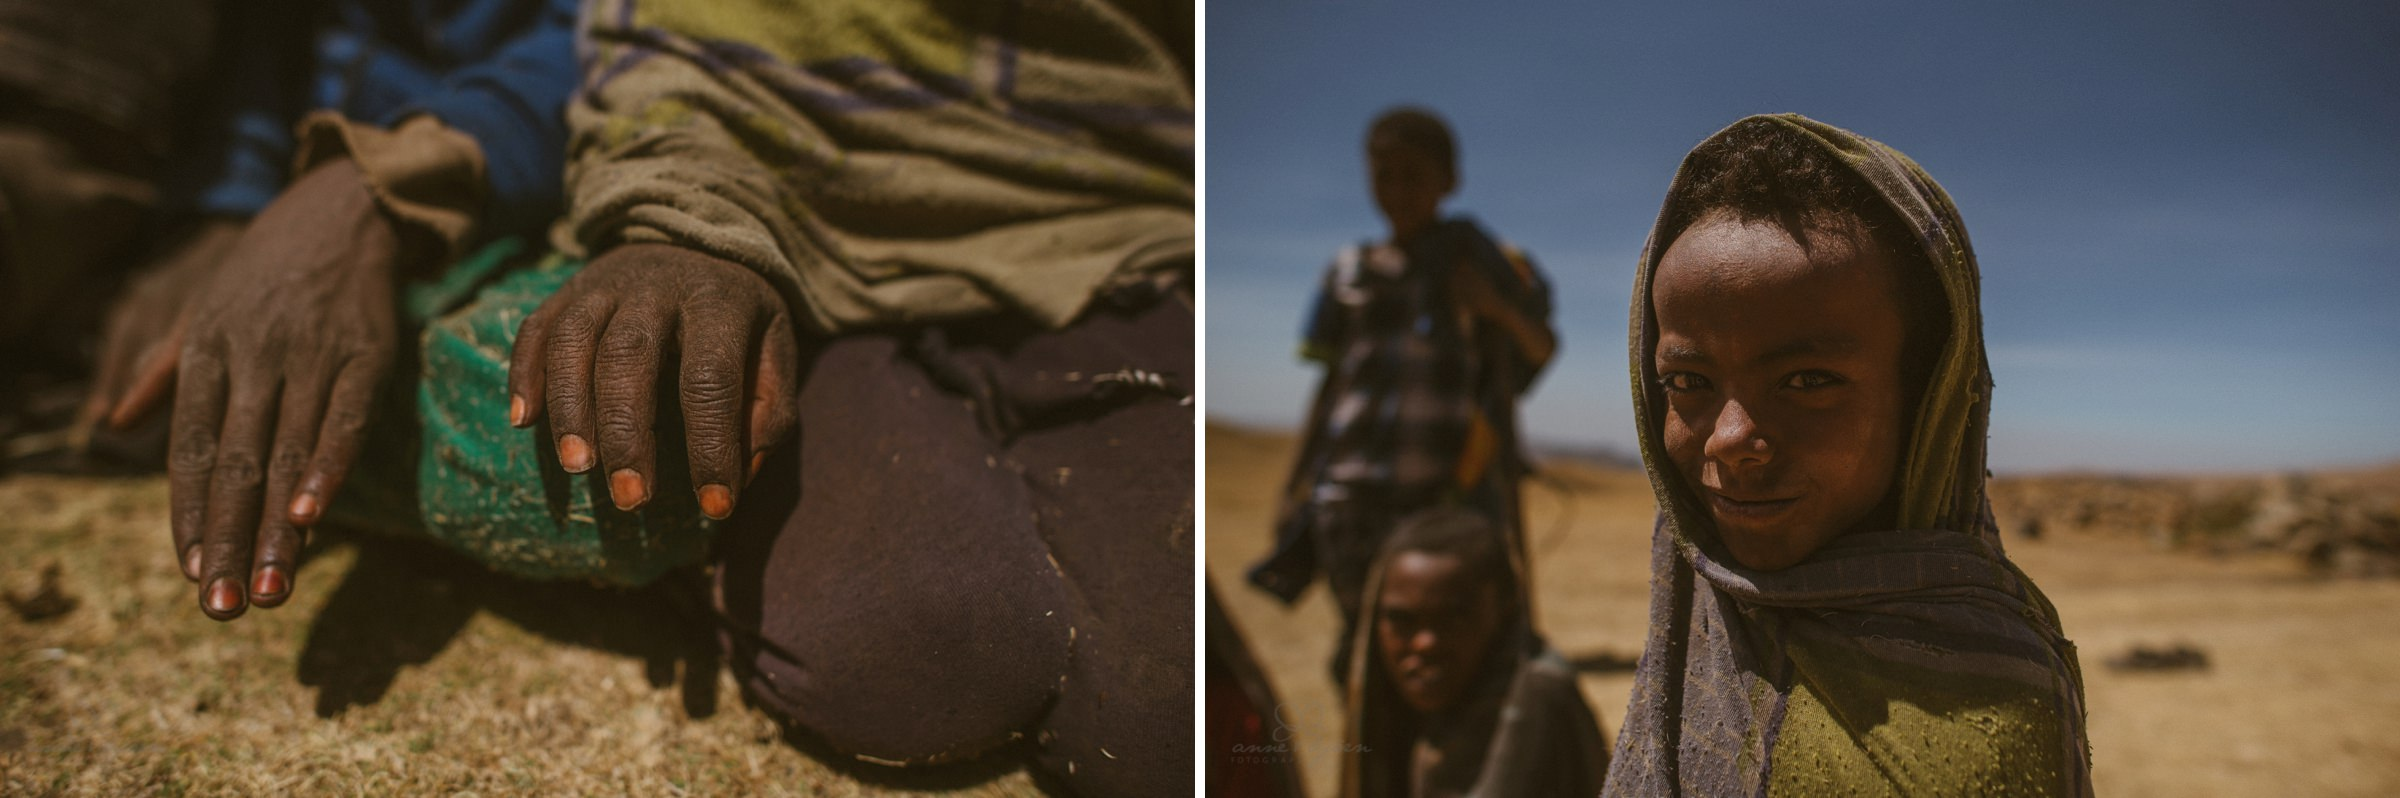 Portrait, Kinder, Wüste, Hände, Fingernägel, Afrika, Ethopia